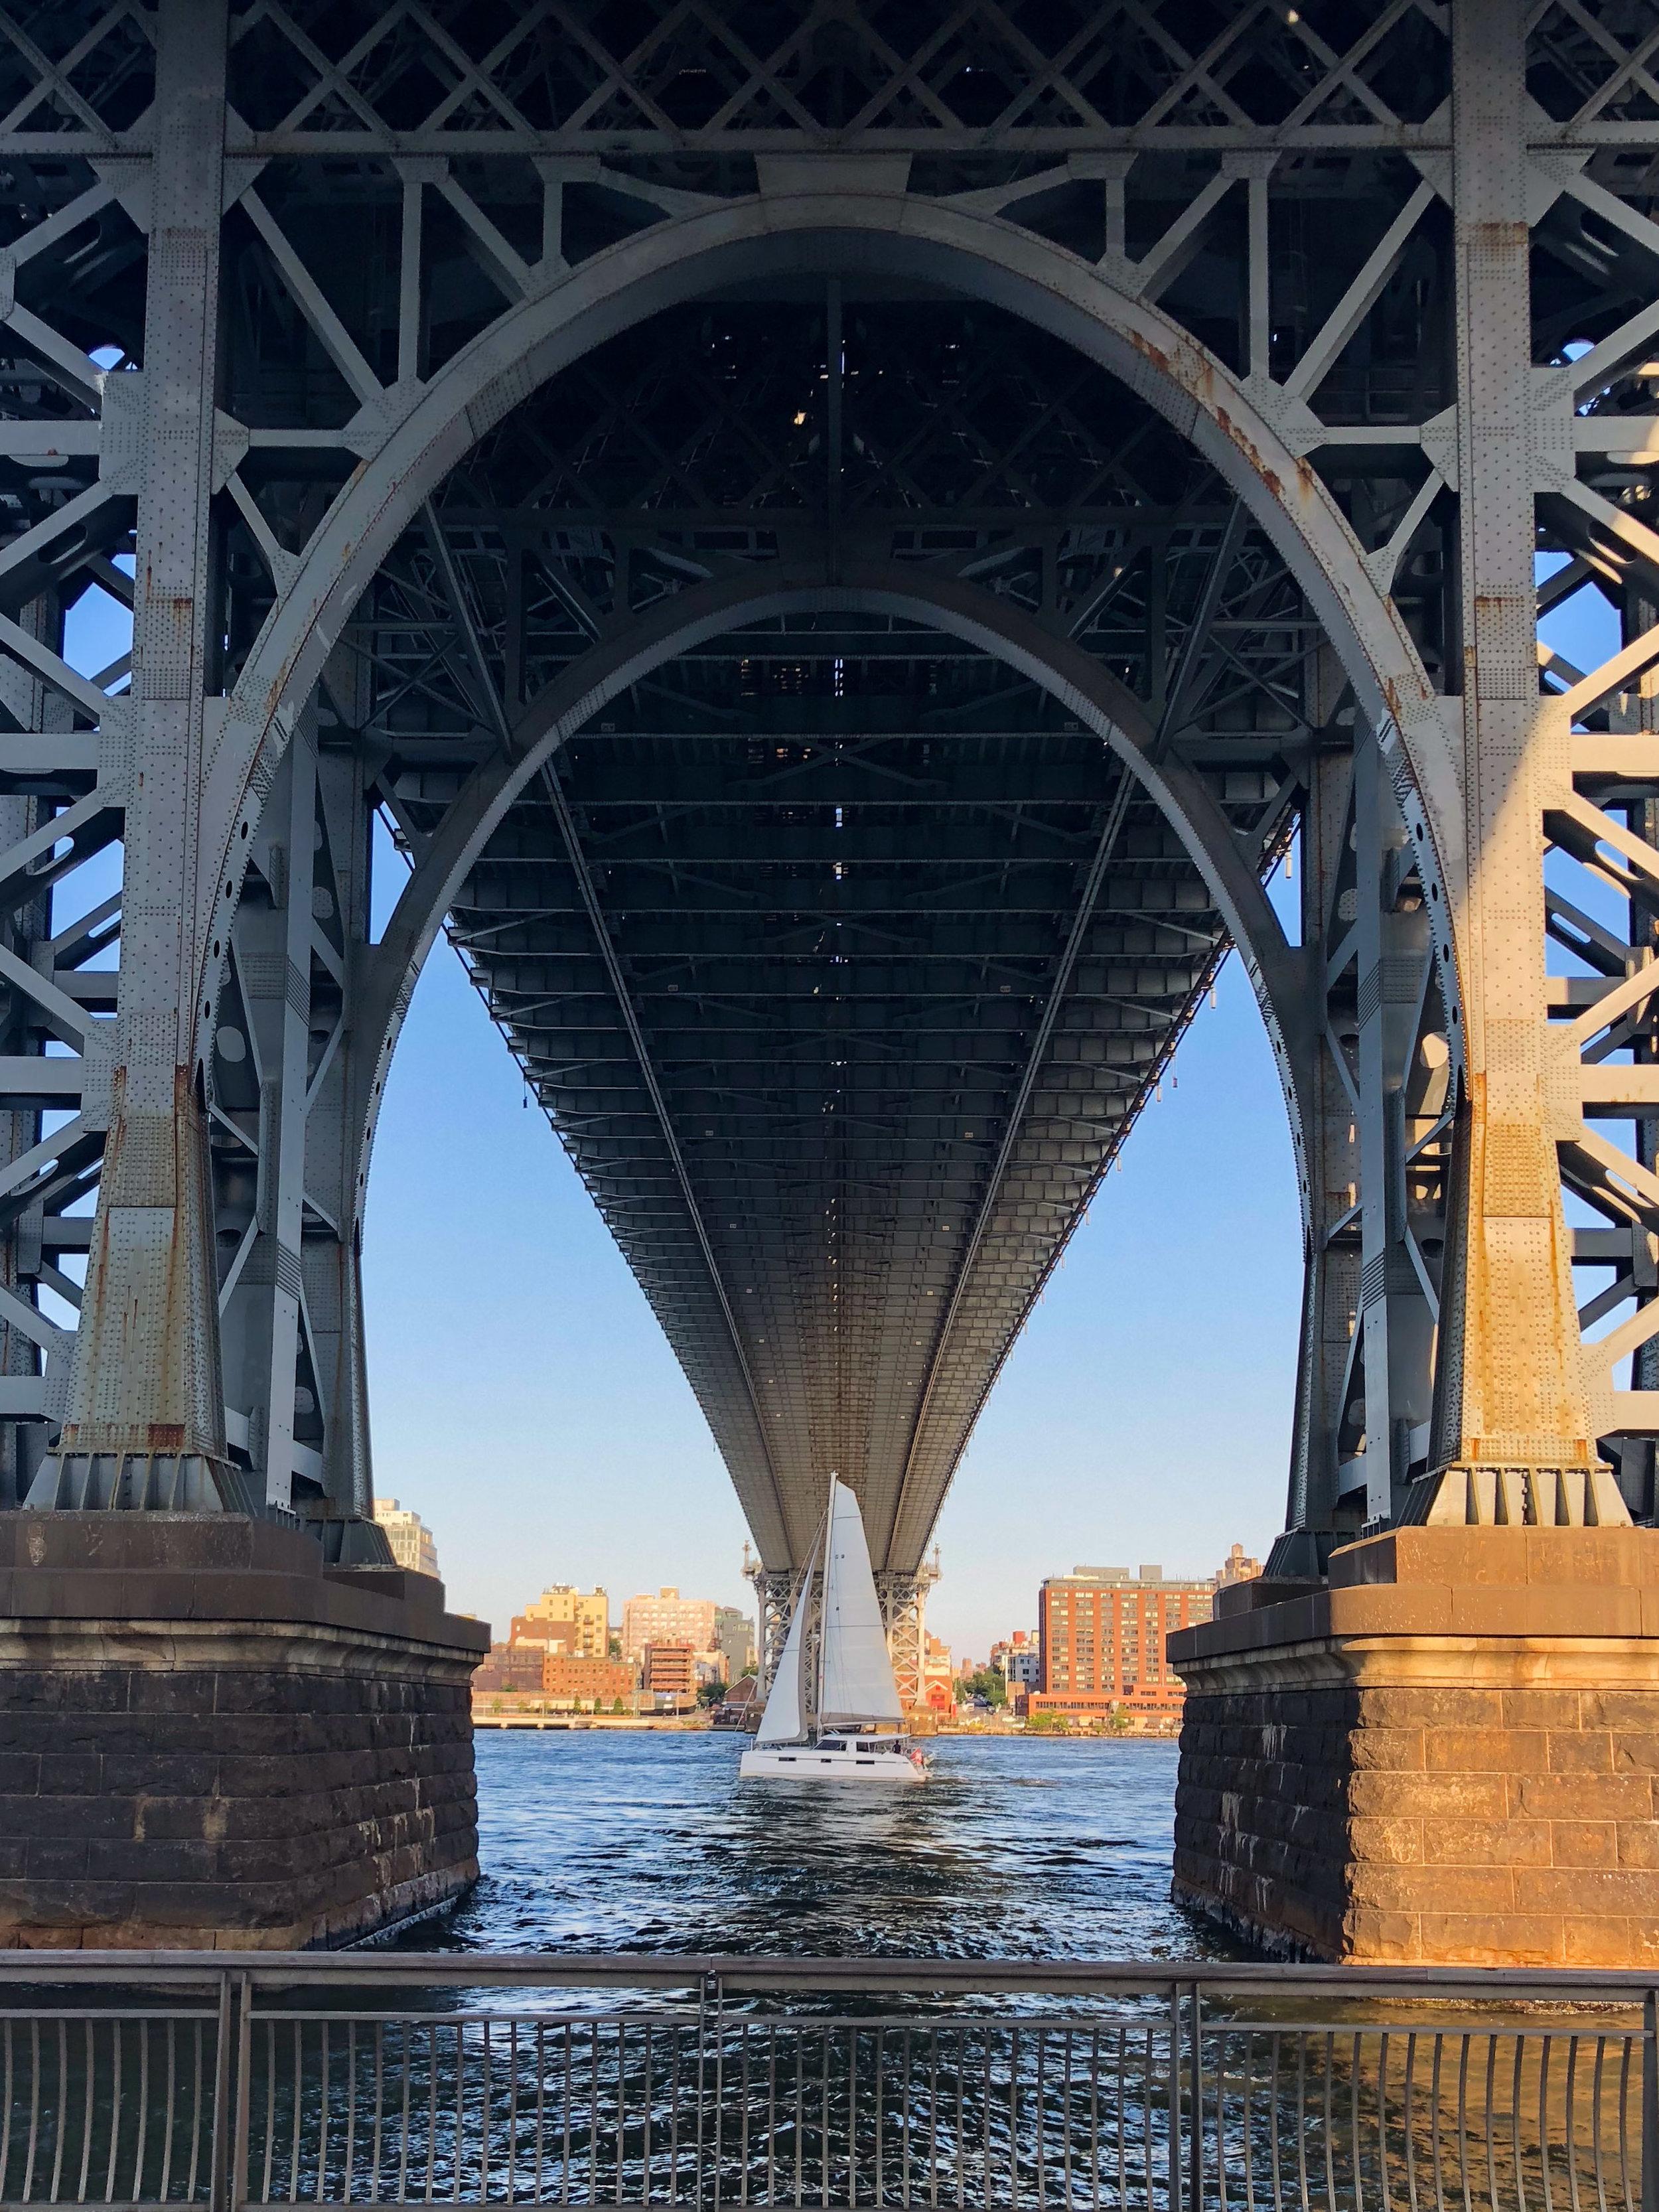 Under the Bridge. Williamsburg Bridge, New York City 2018